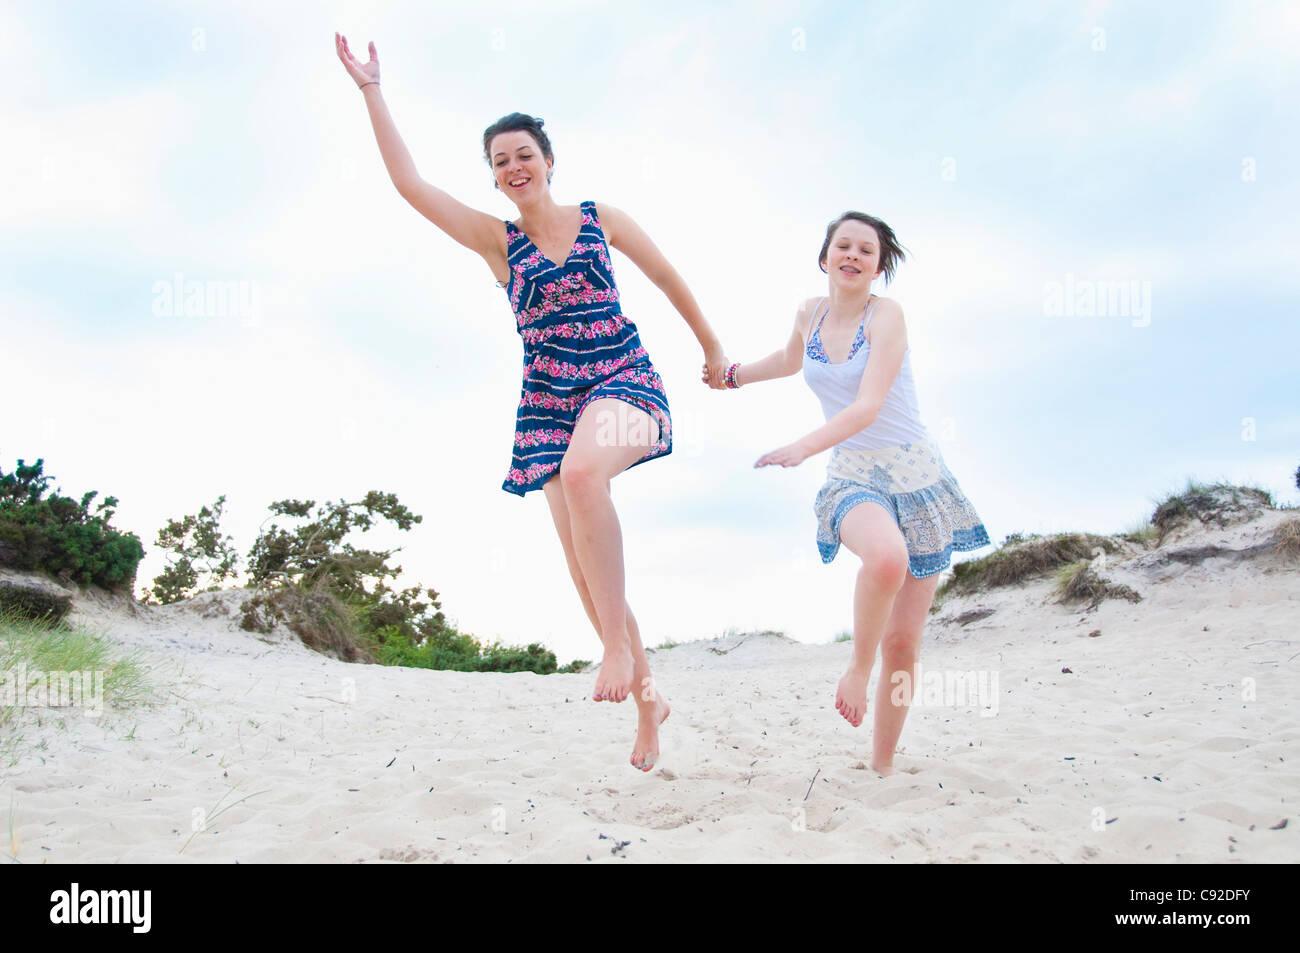 Woman and girl running on beach Stock Photo